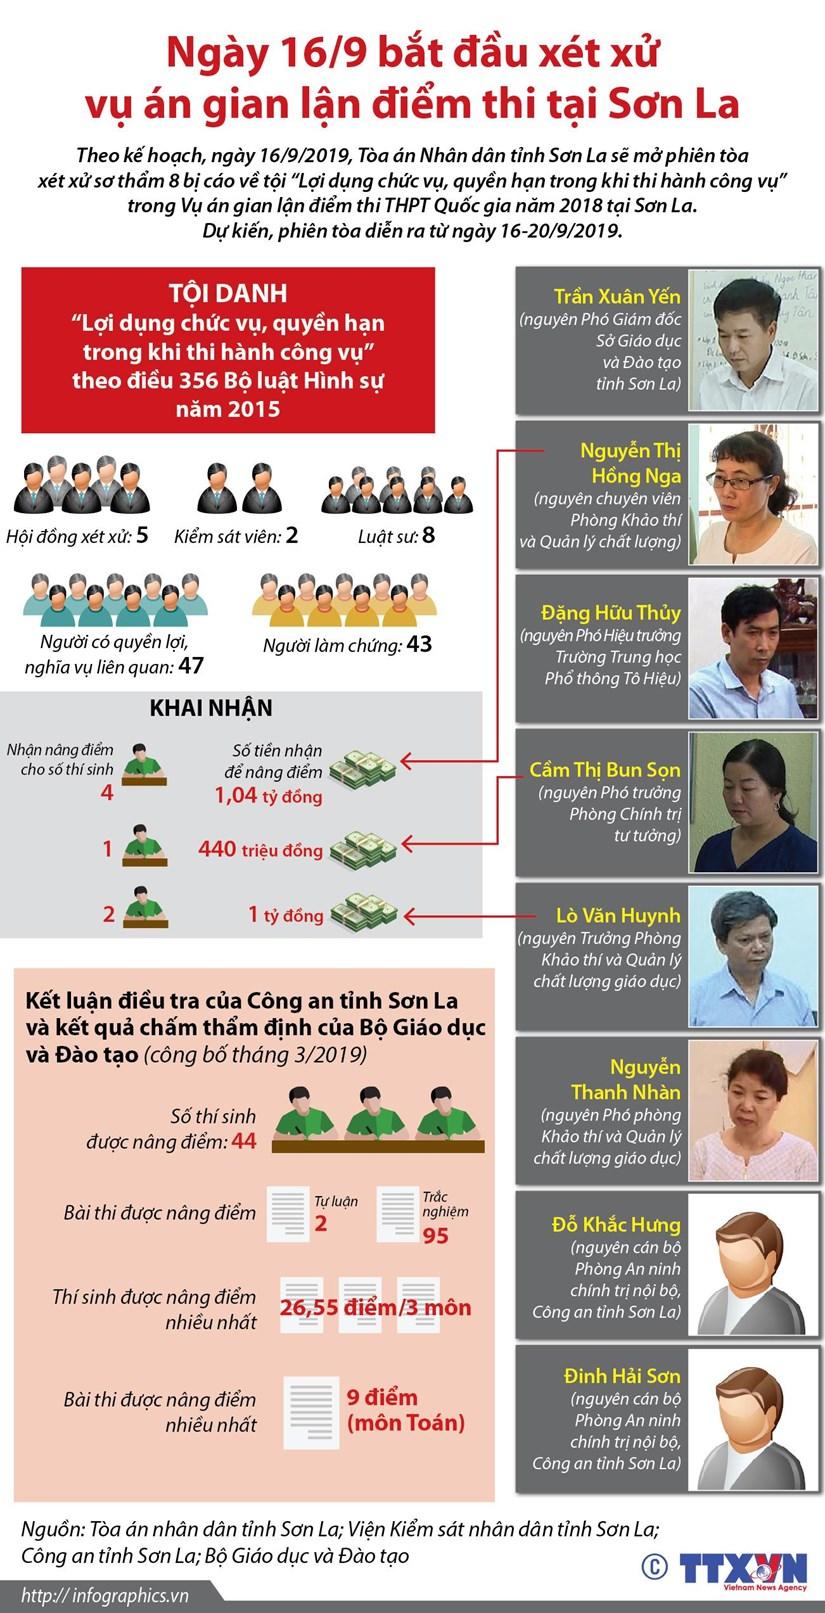 [Infographics] Xet xu vu an gian lan diem thi tai Son La vao ngay 16/9 hinh anh 1